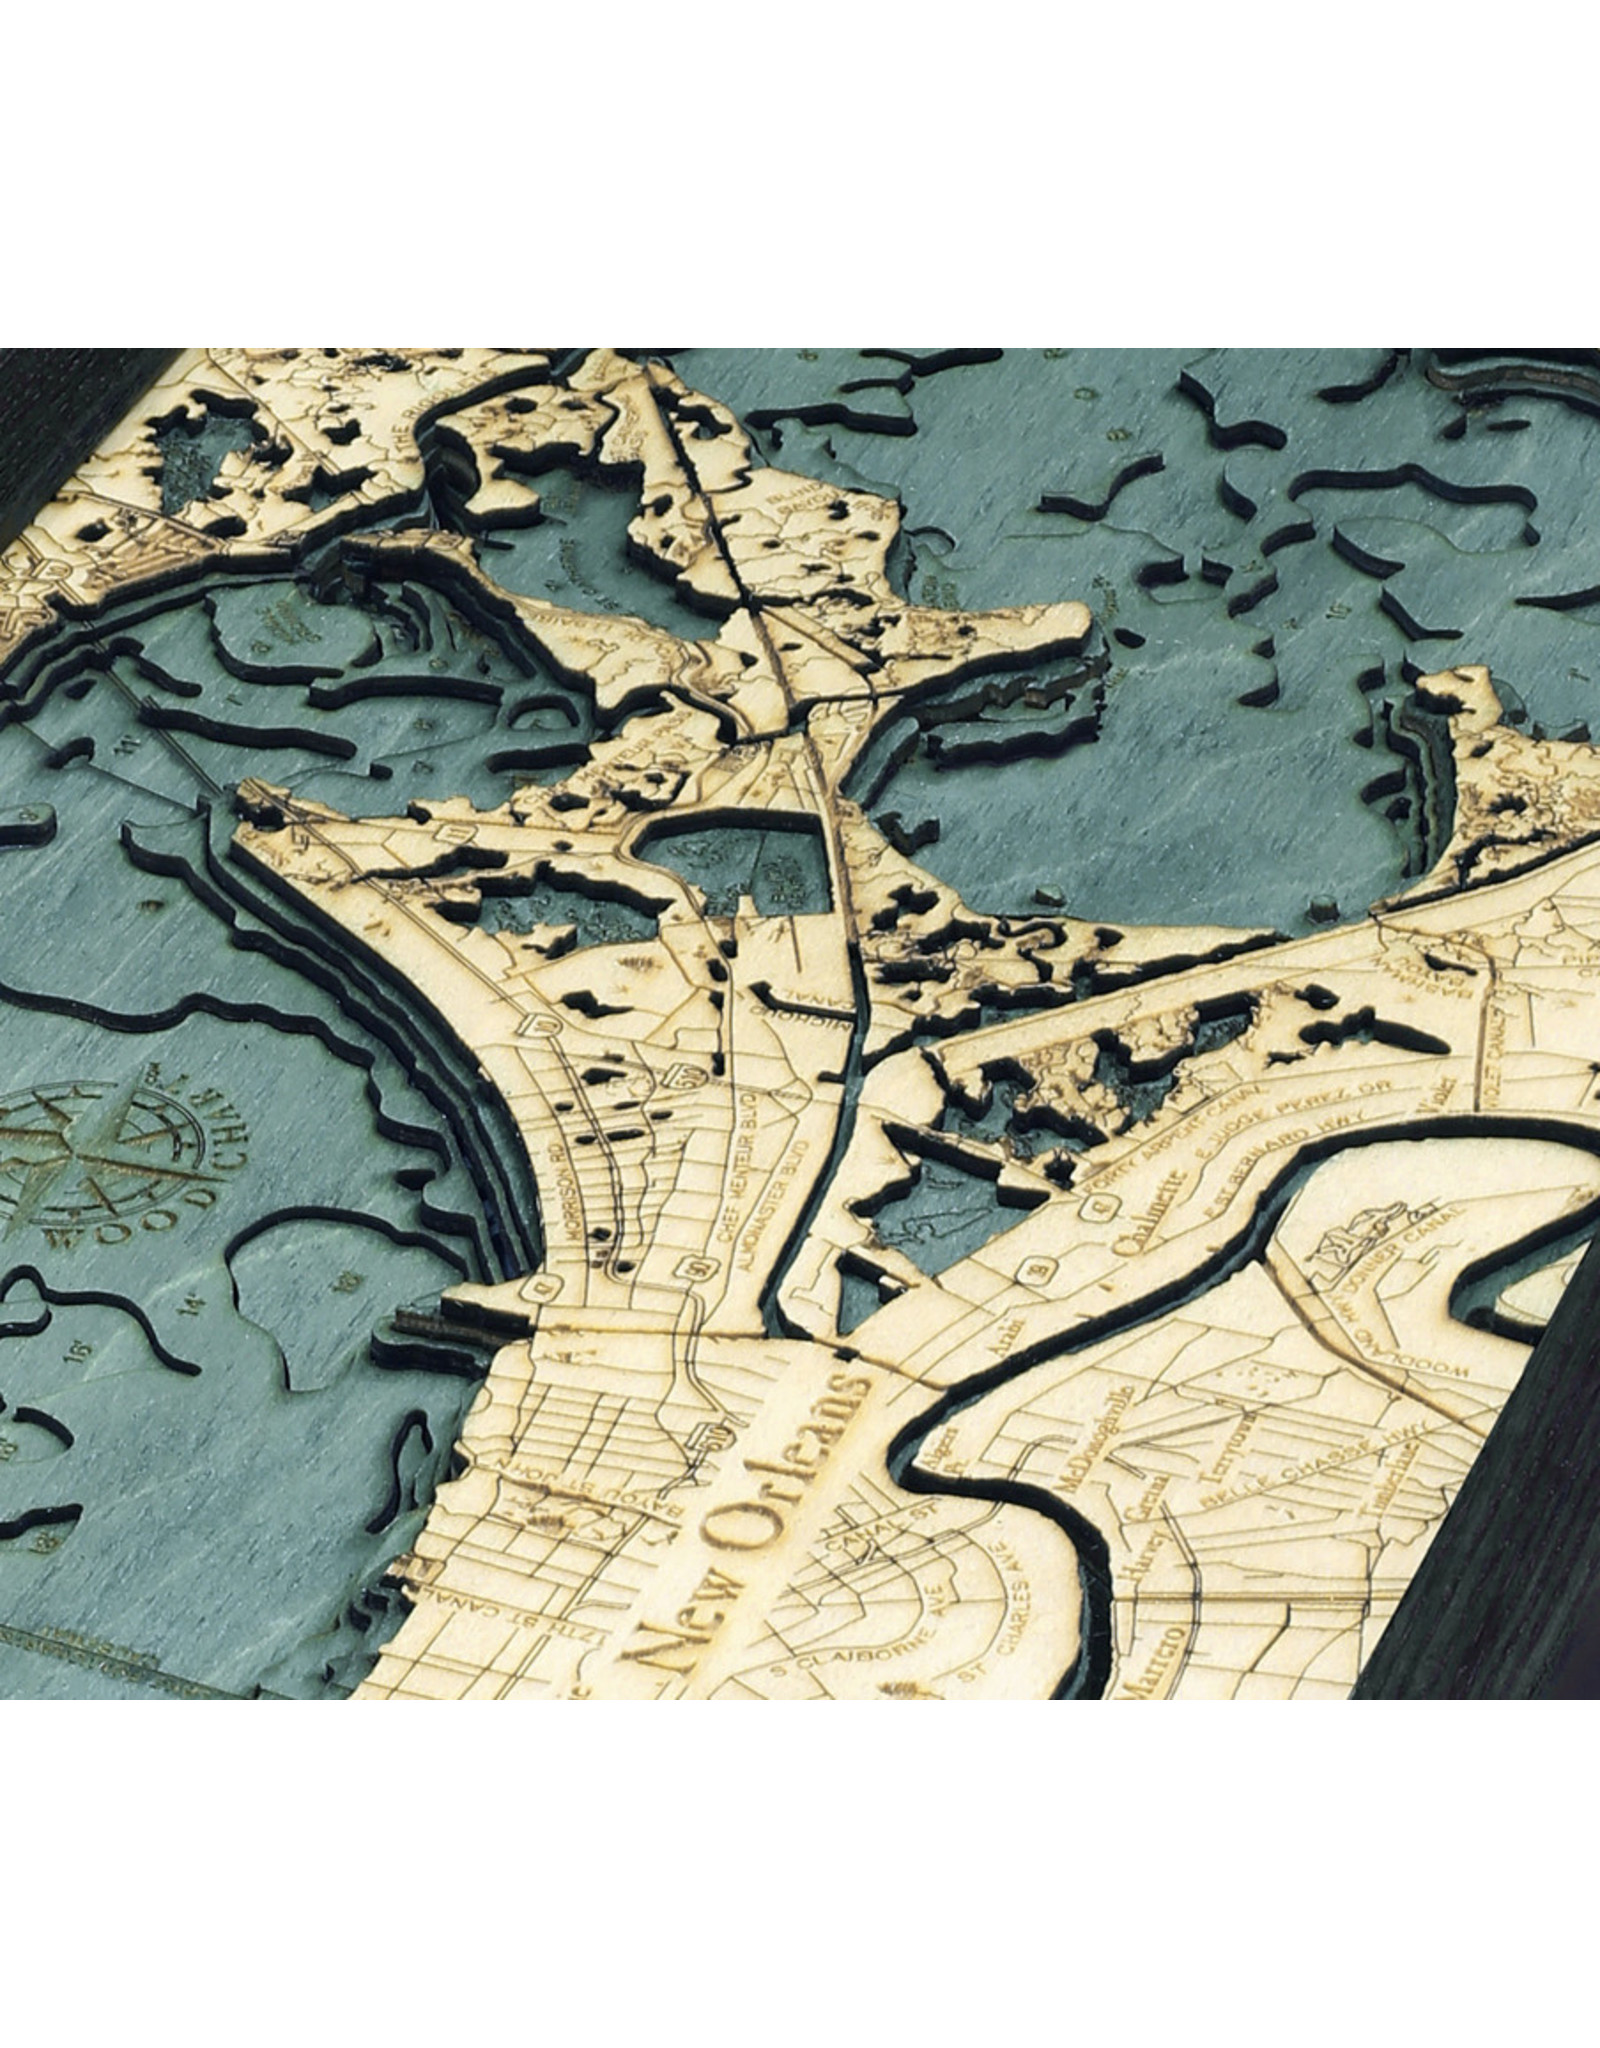 WoodCharts New Orleans (Bathymetric 3-D Nautical WOODCHART)